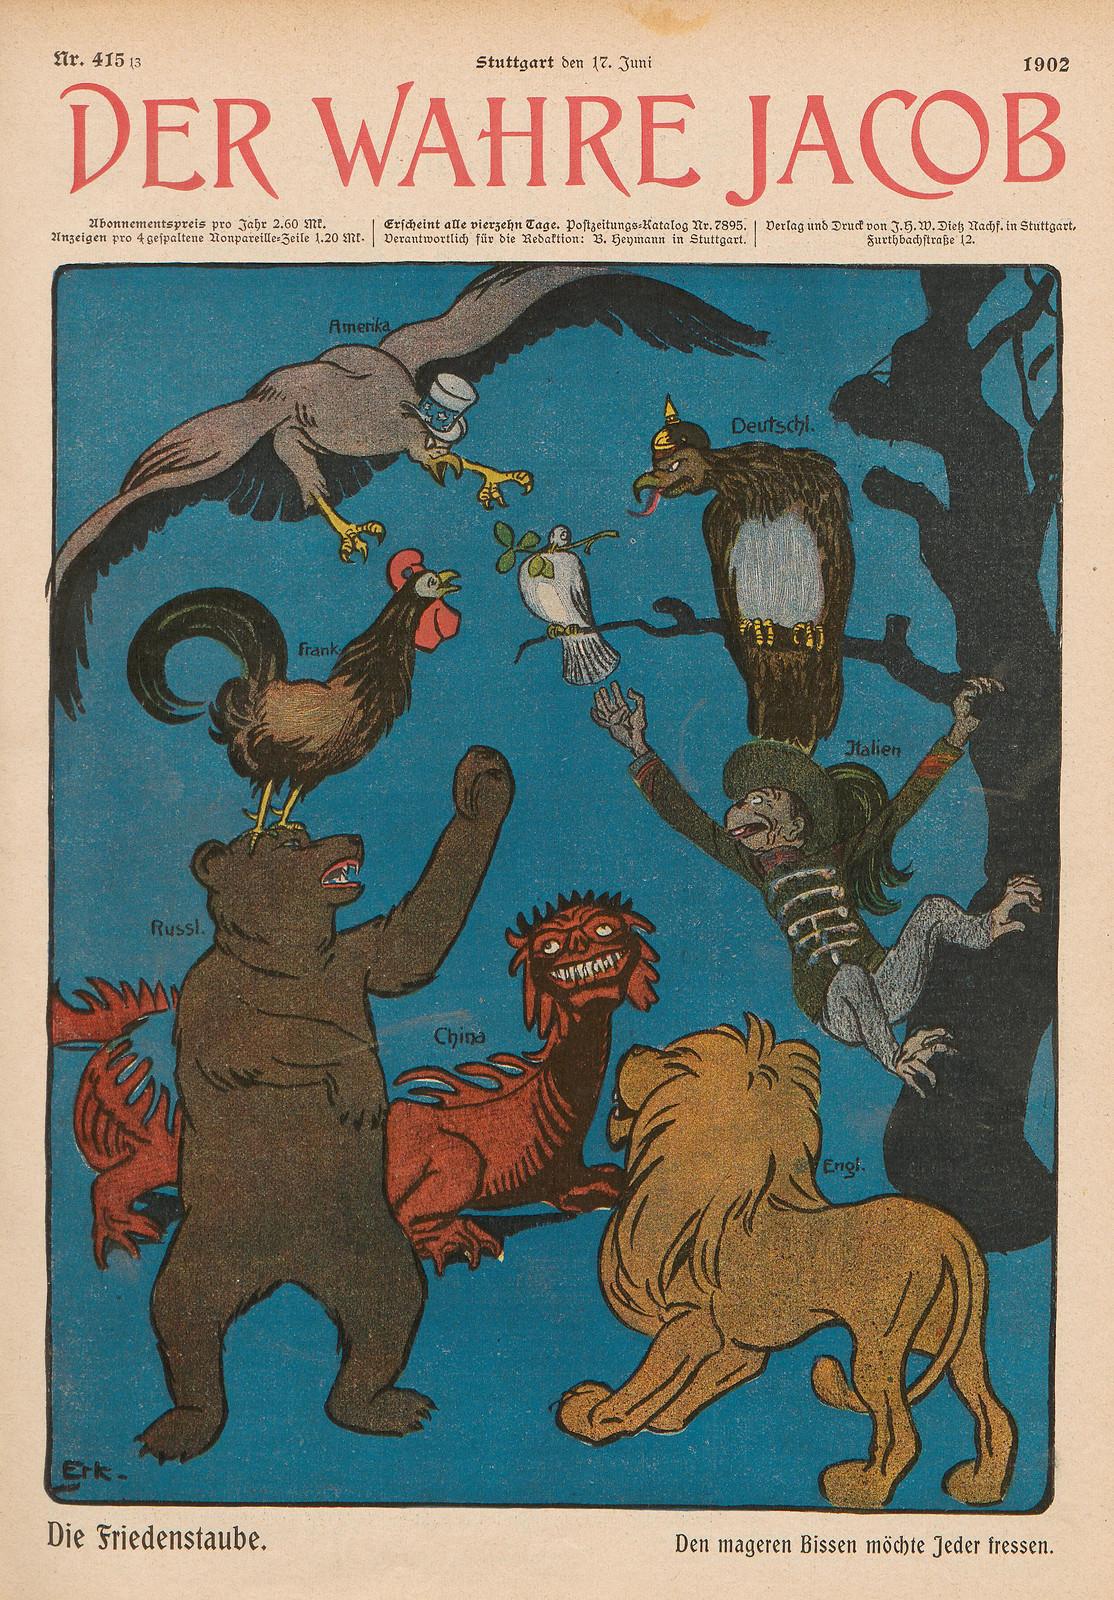 Emil Erk - The Peace Dove, 1902